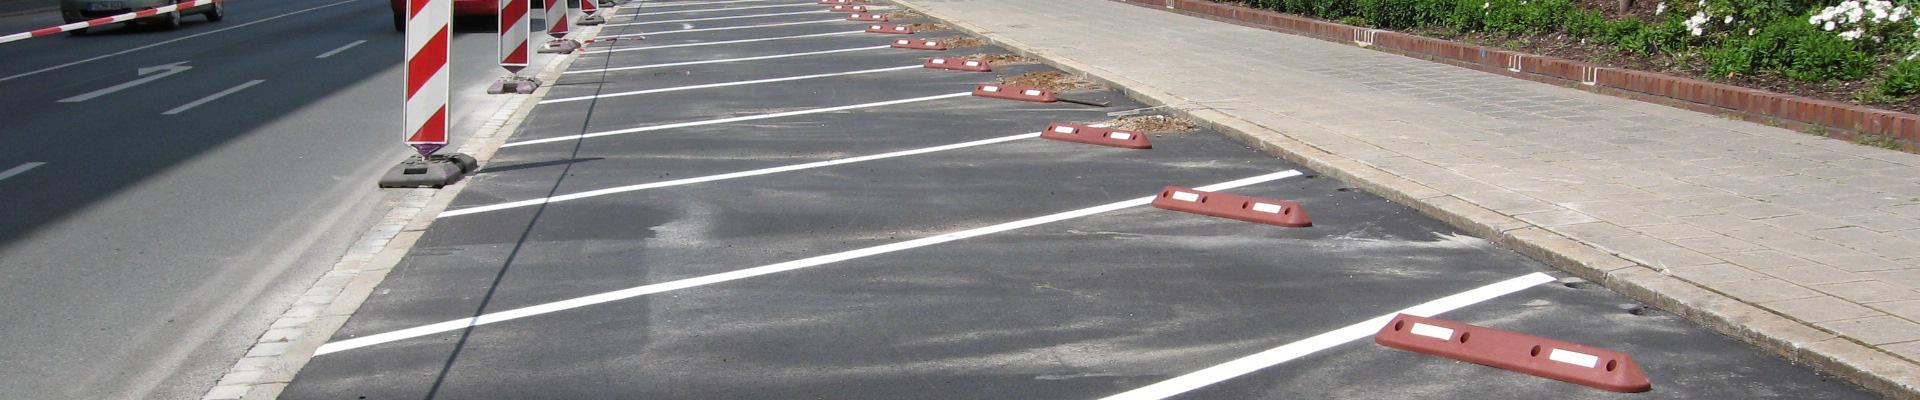 Ph Gummitechnik Parkplatzstopp